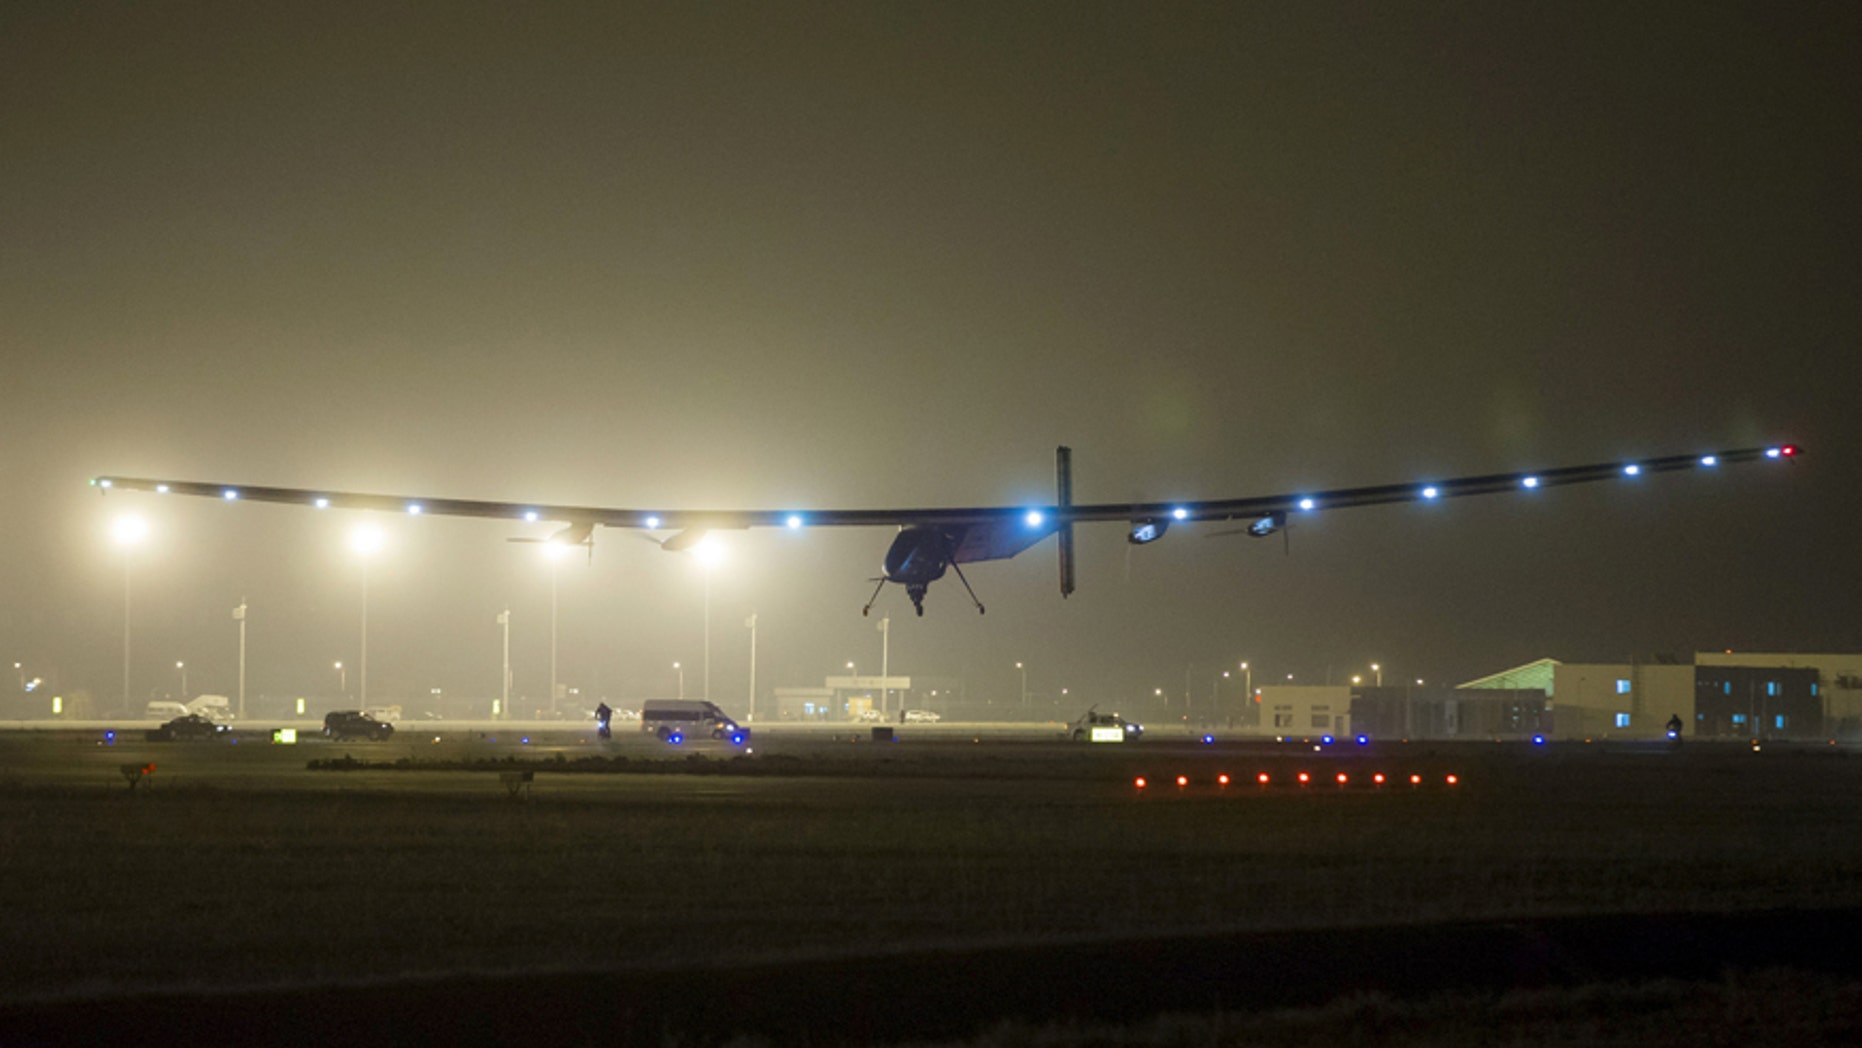 The Solar Impulse 2 plane is seen landing at Nanjing Lukou International Airport, Jiangsu province April 21, 2015.